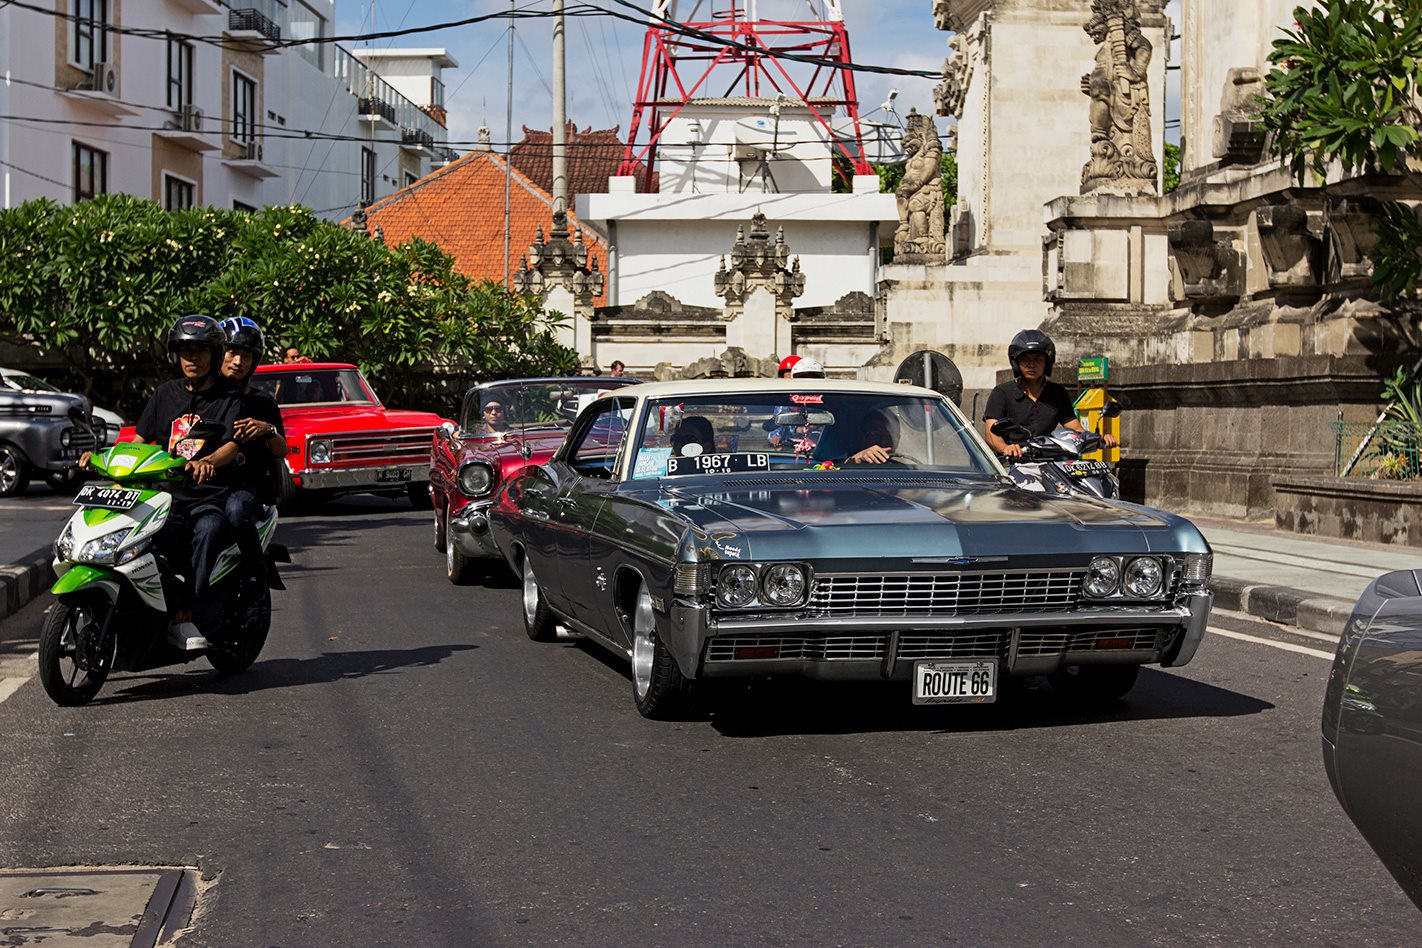 1968 Chev Impala 307